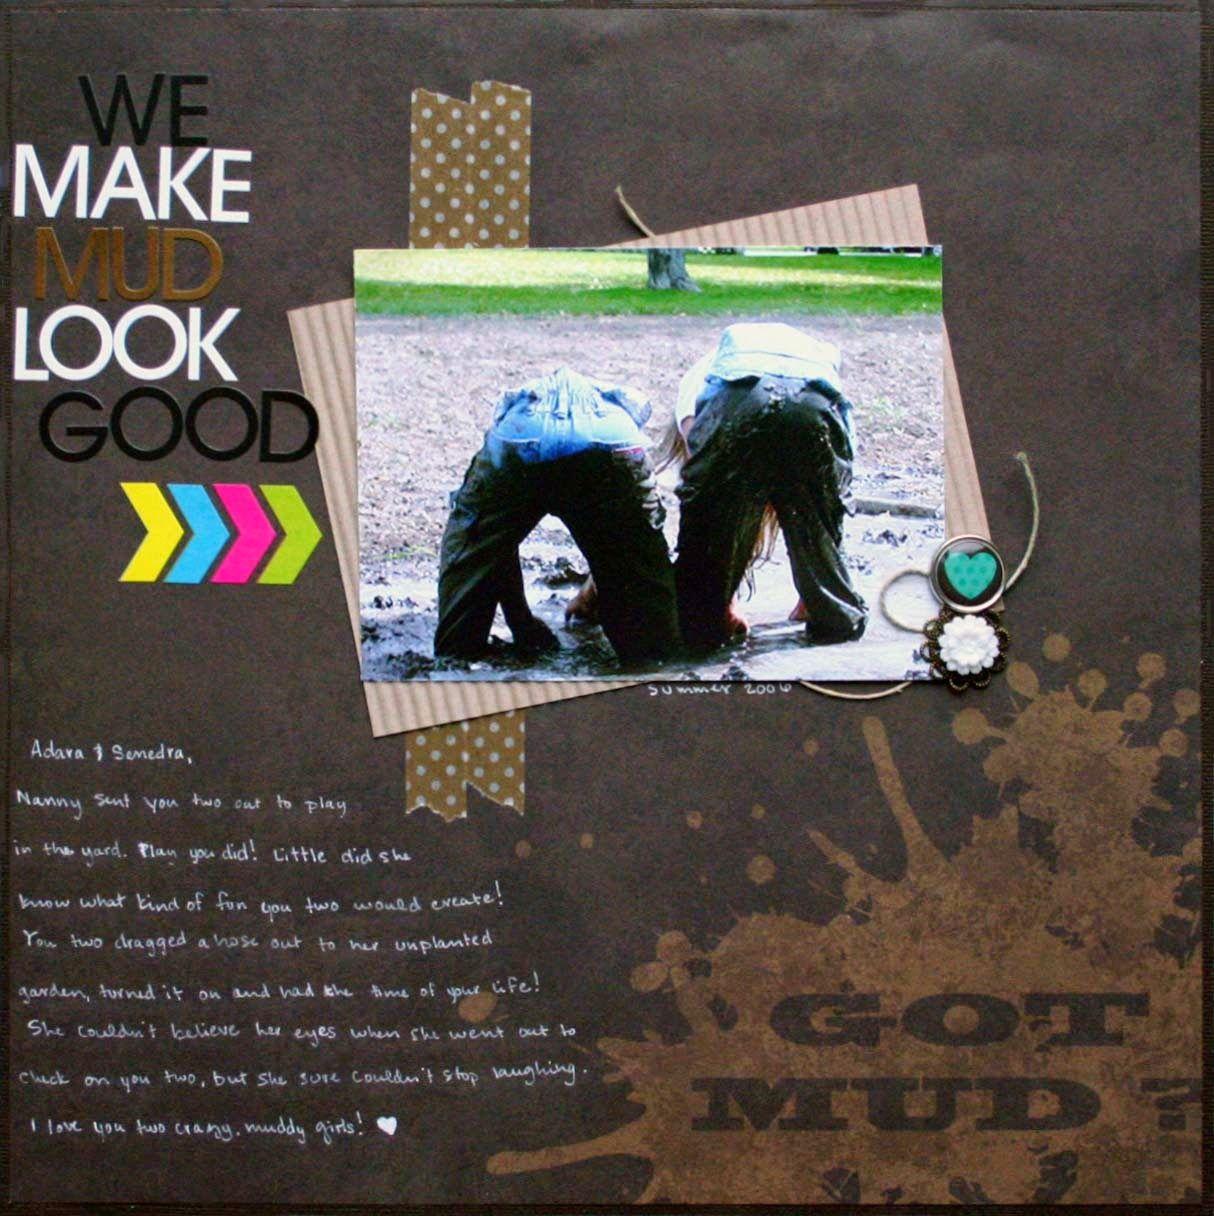 How to make scrapbook look good - We Make Mud Look Good By Muse Amelia Harris Moxxie Funrun Scrapbook